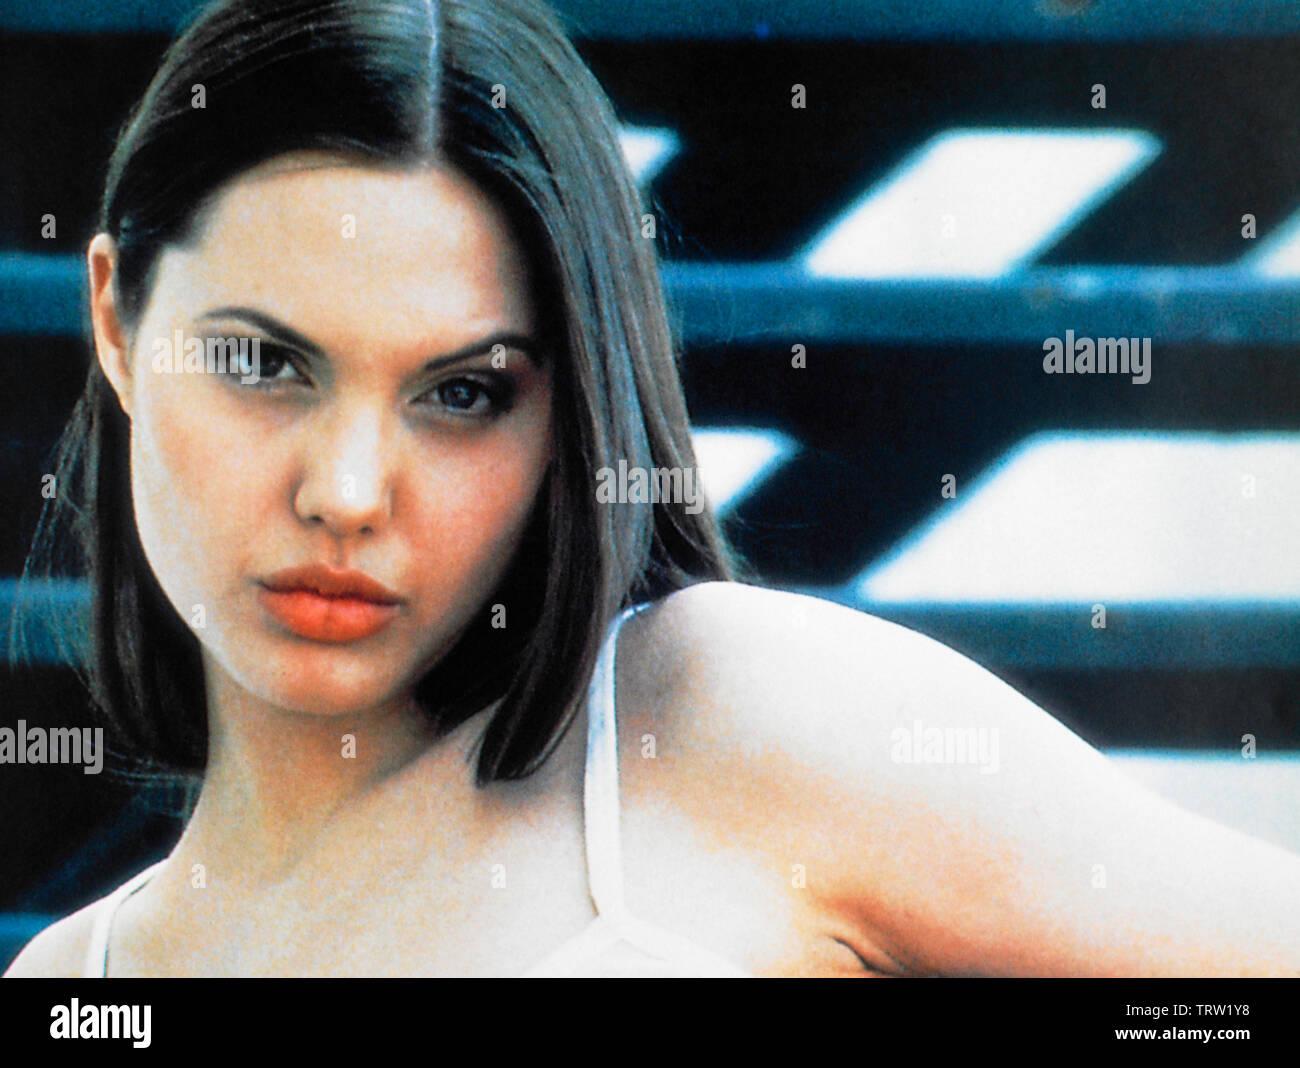 Angelina Jolie Cyborg 2 1993 angelina jolie in cyborg 2 (1993). copyright: editorial use